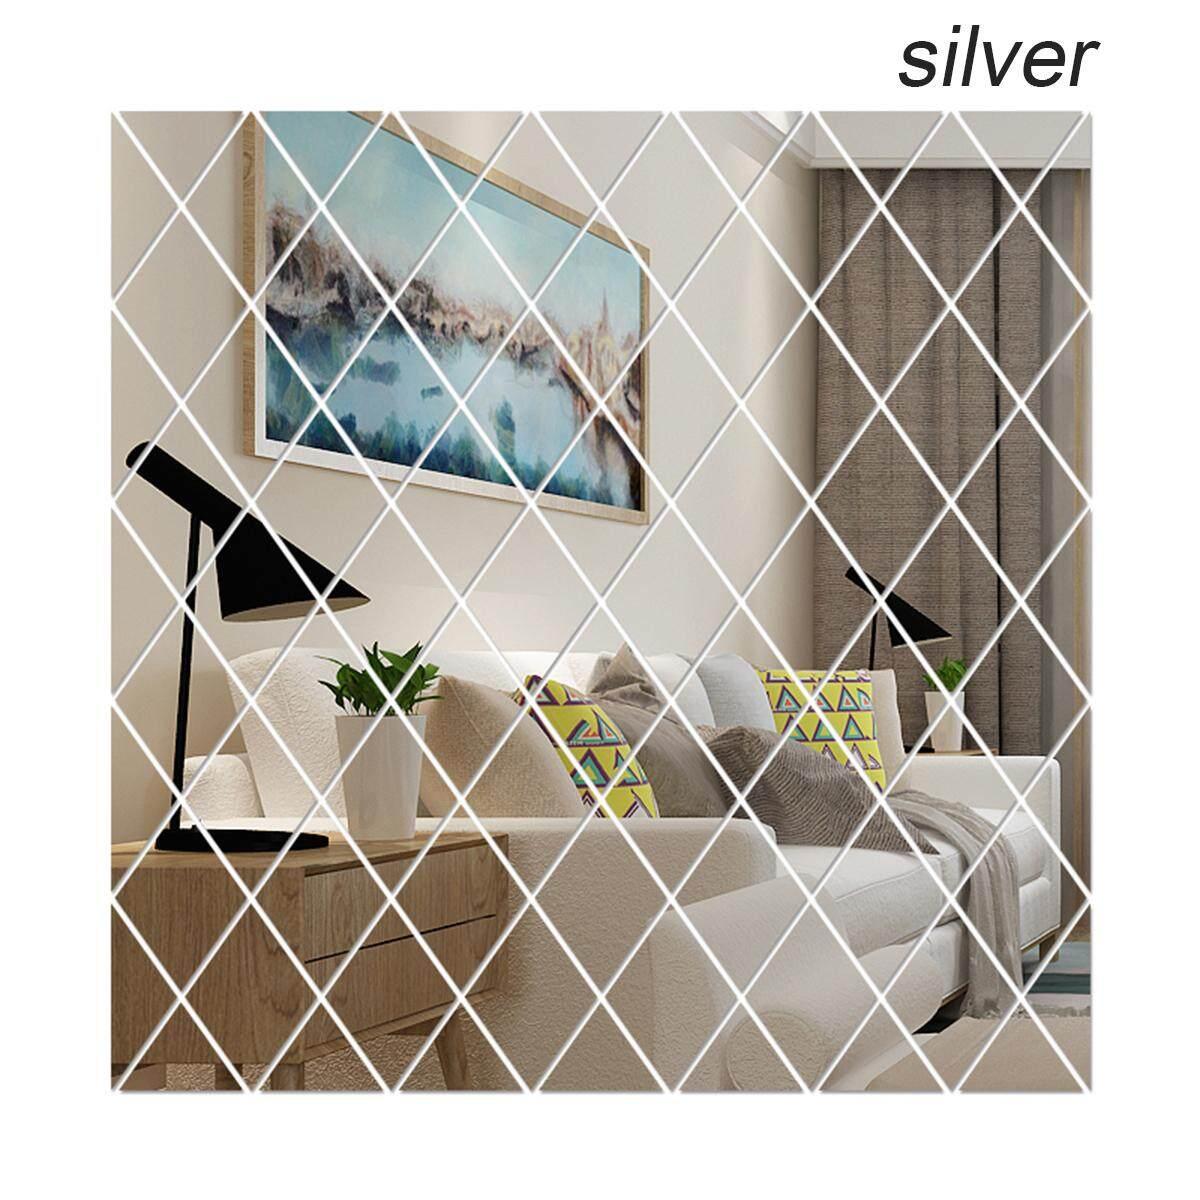 [S / M / L ] Diamonds Triangles Acrylic Mirror Wall Sticker 3D DIY Living Room Home Decor (50*50cm,50*100cm,100*100cm)